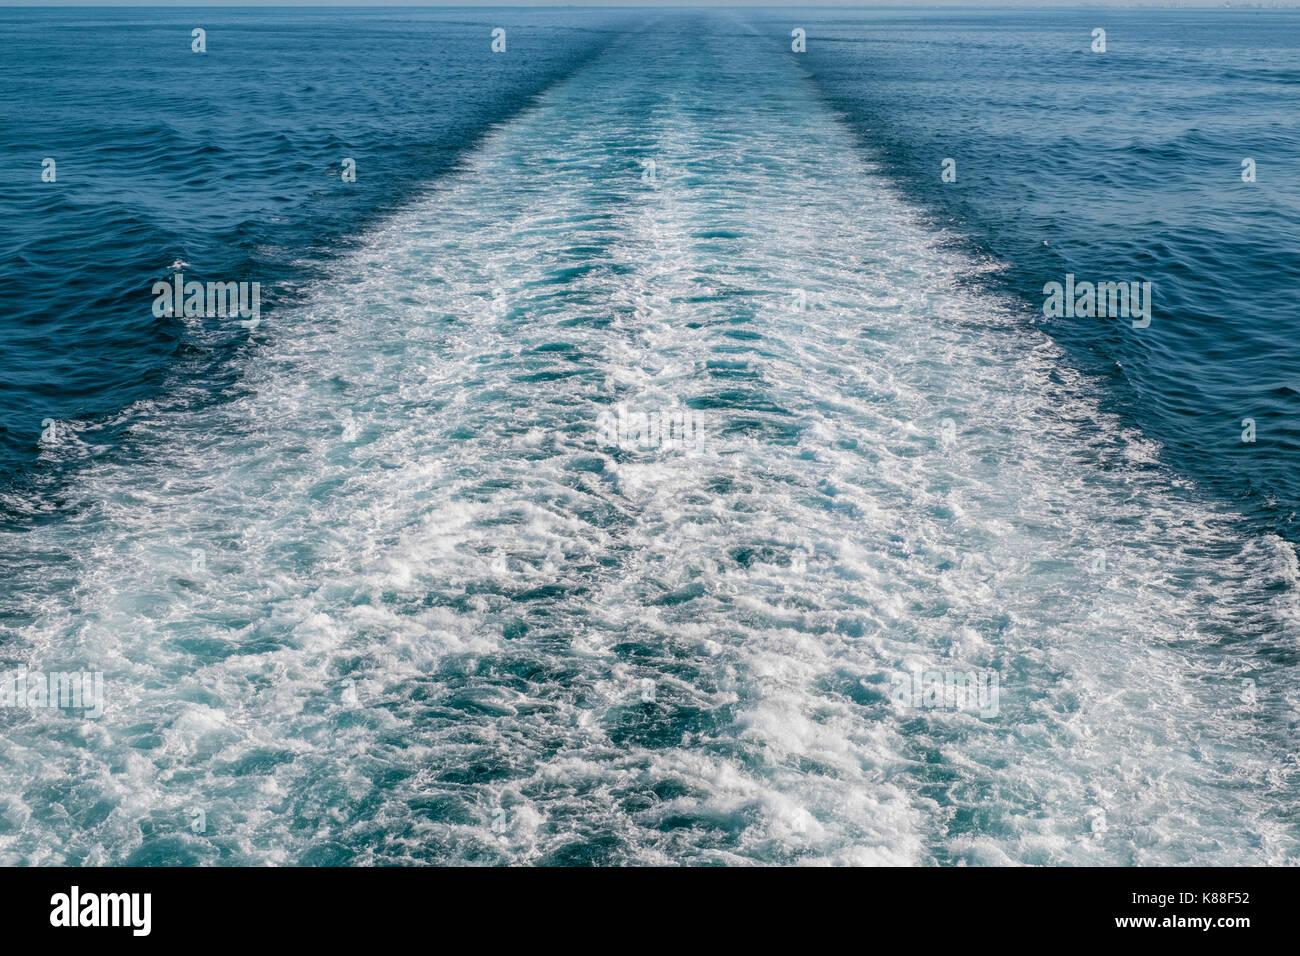 Wake in the Tyrrhenian Sea made by cruise ship - Stock Image